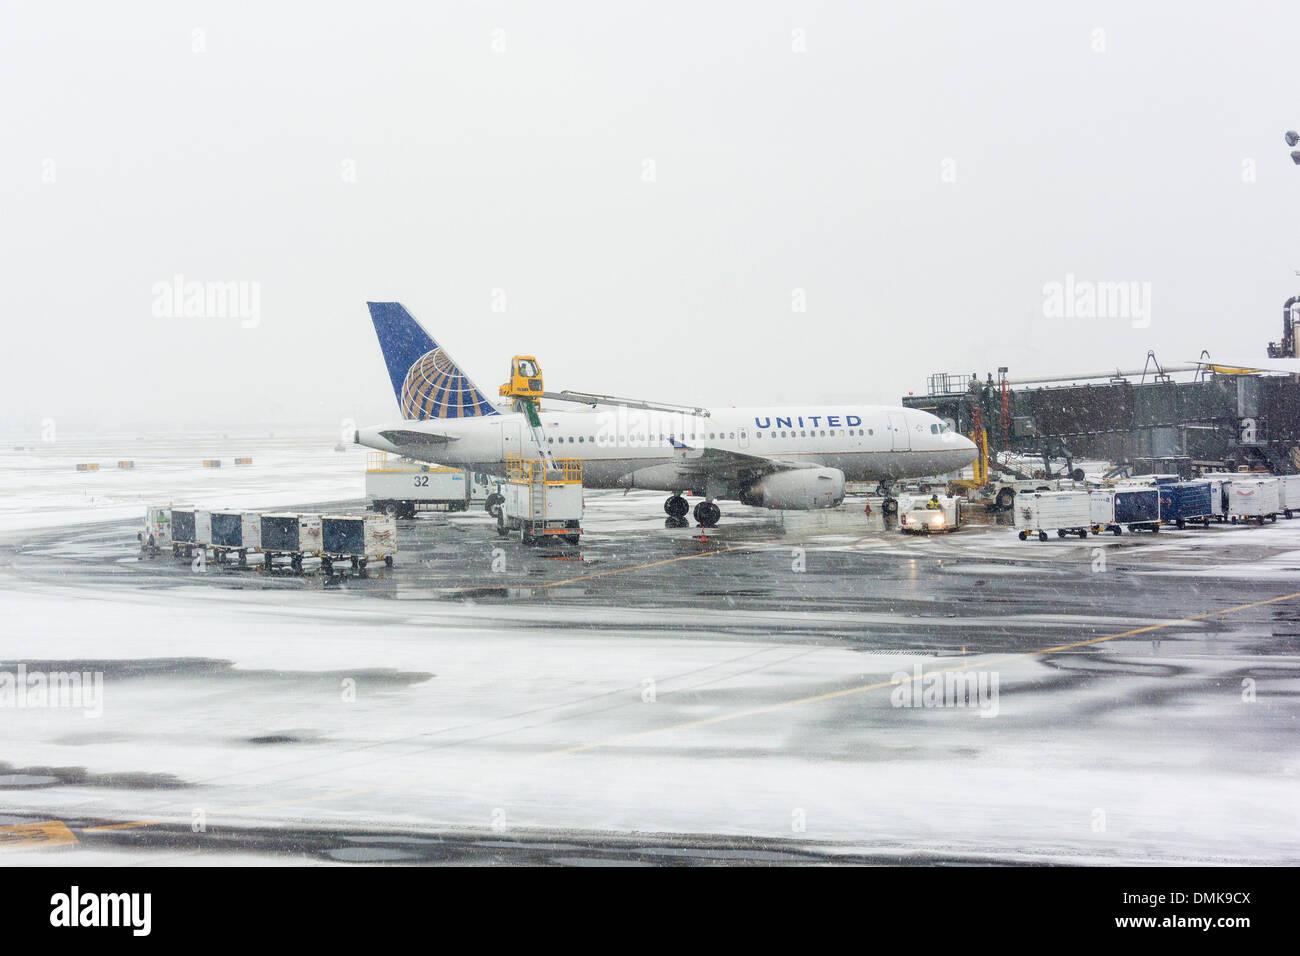 Aeroporto Ewr : O descongelamento a united airlines aeronaves no ewr aeroporto